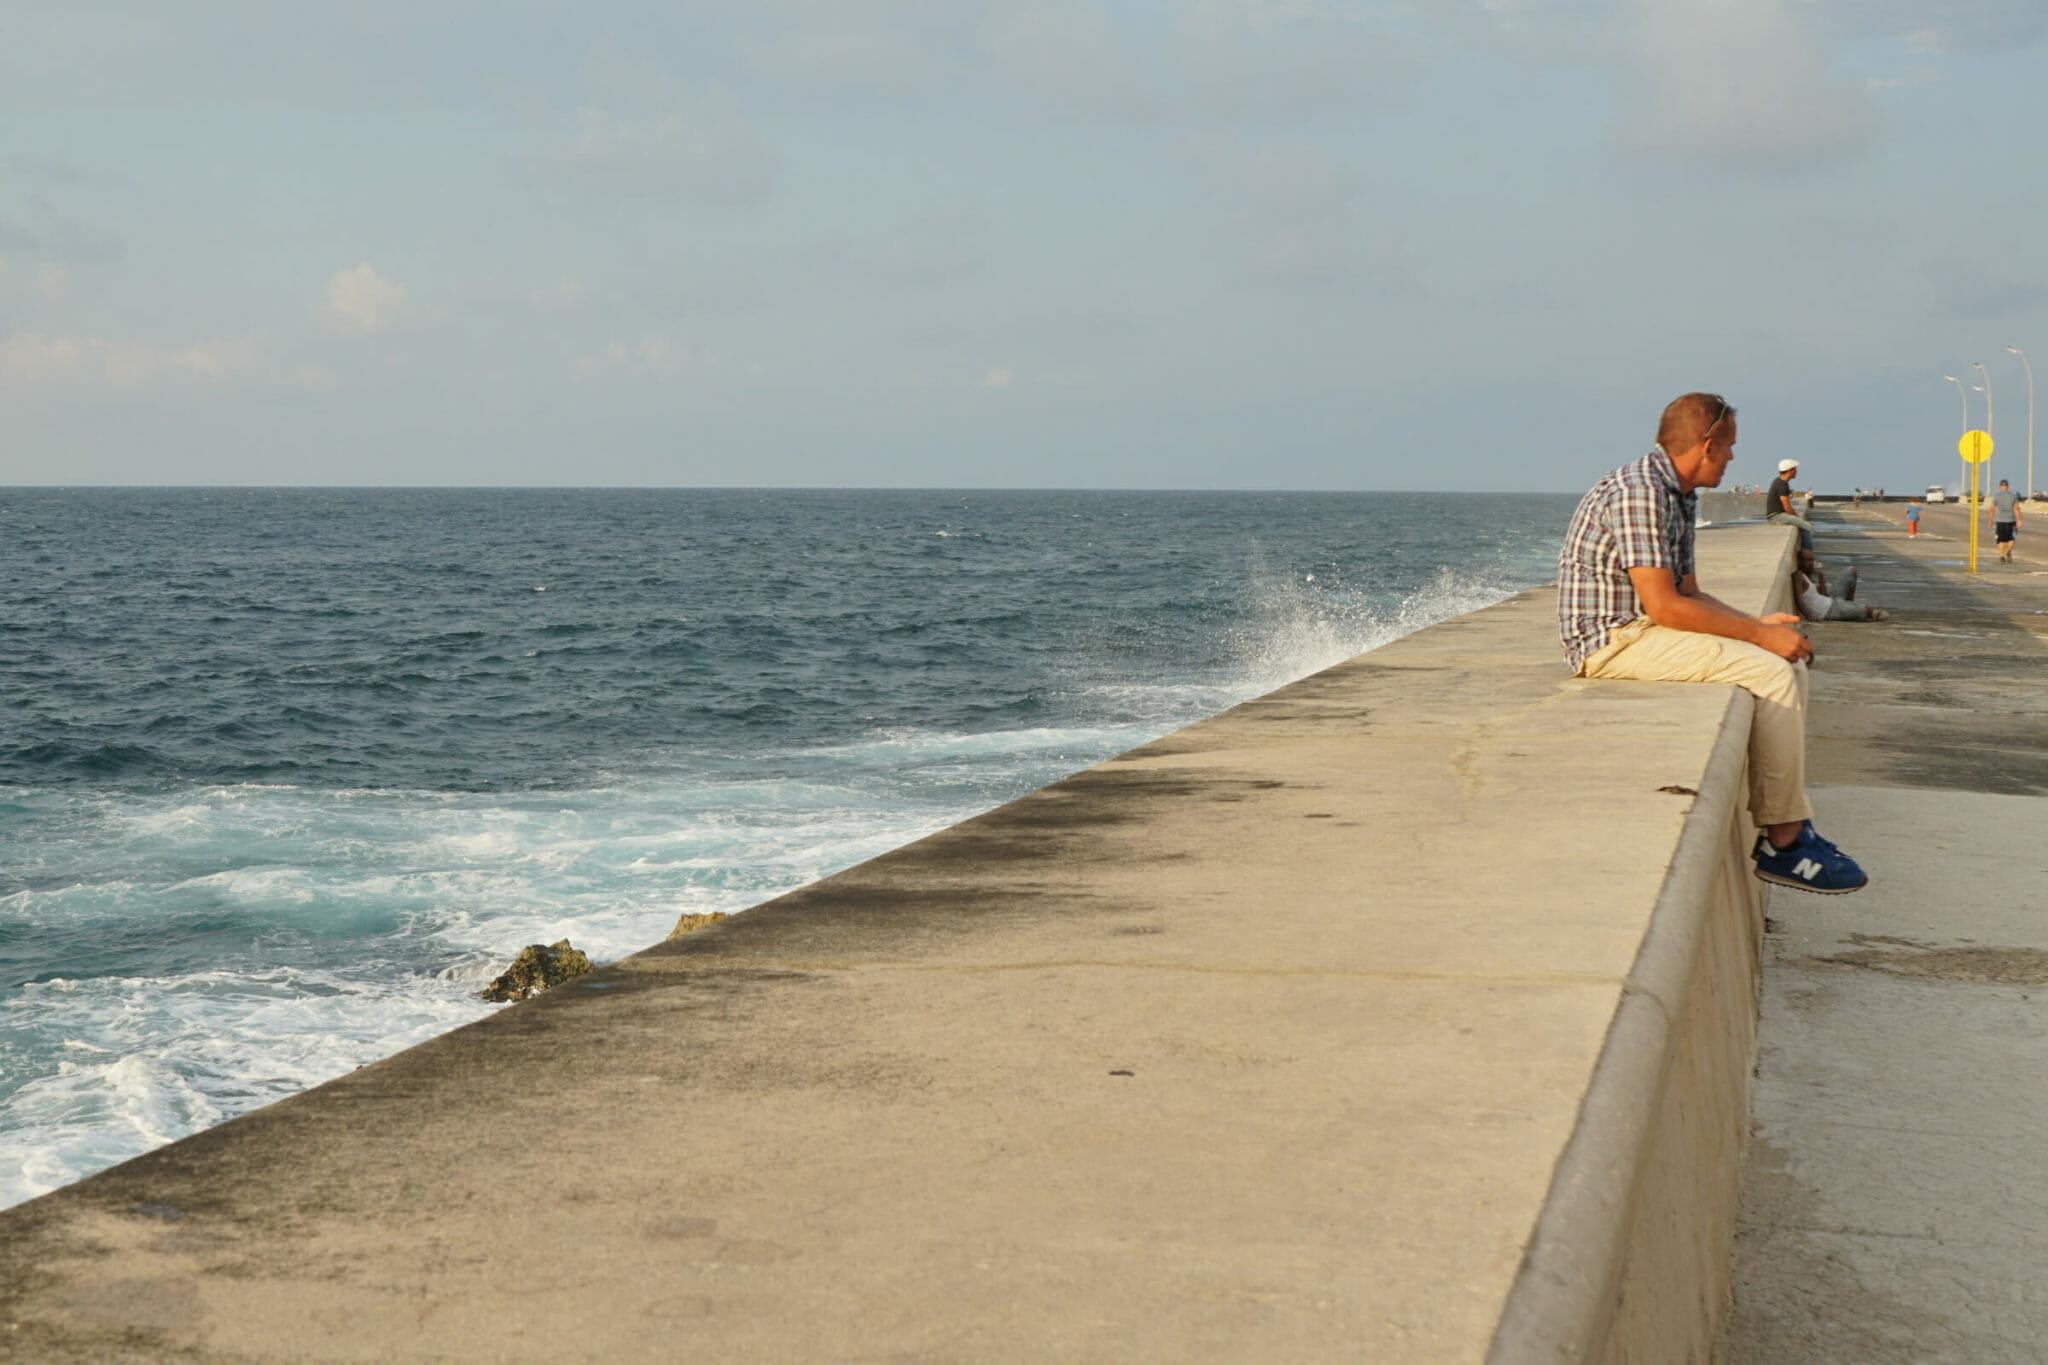 Man sitting by ocean's edge